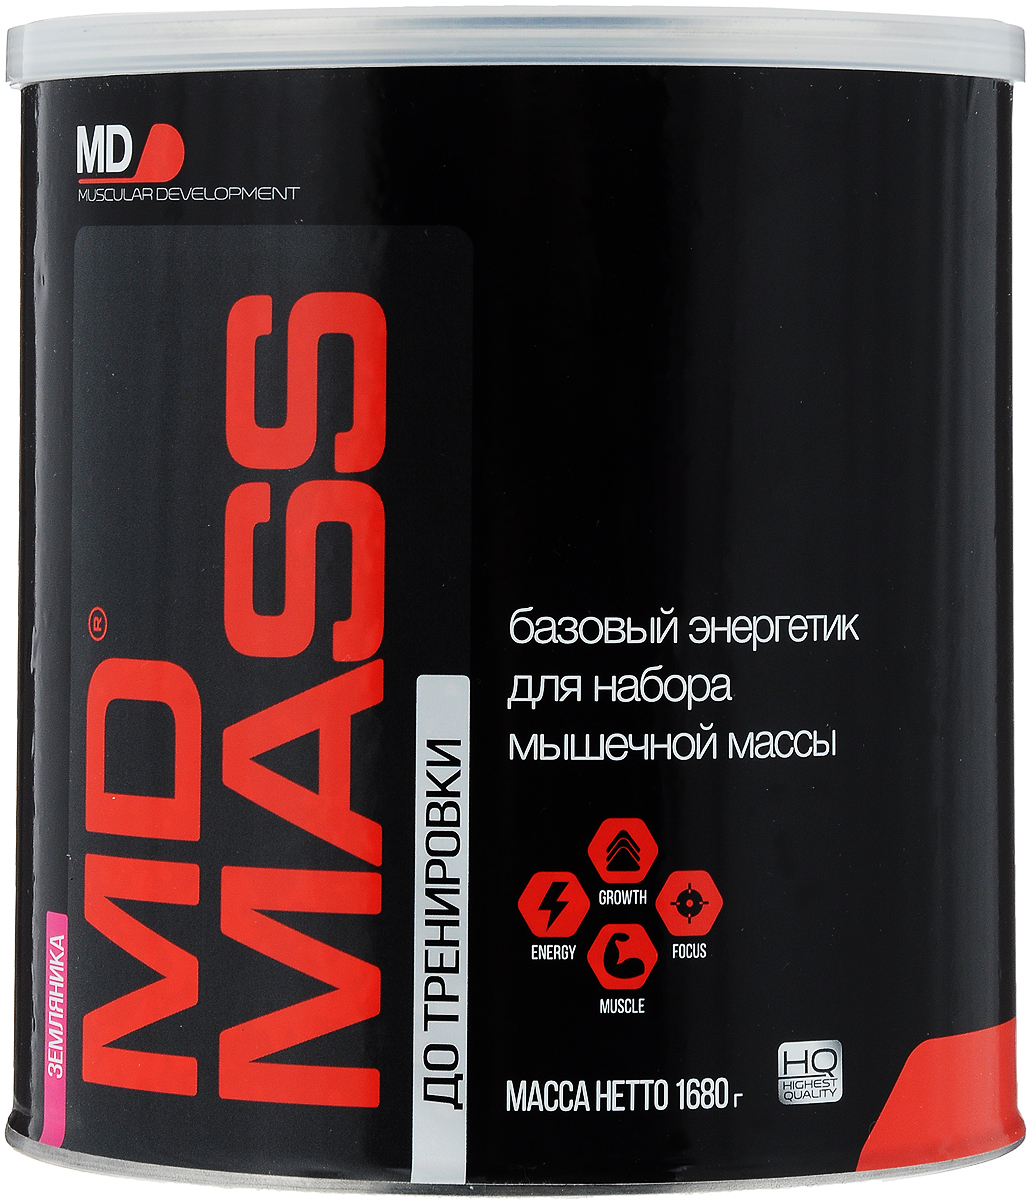 Энергетик MD  Масс , земляника, 1,68 кг - Энергетики